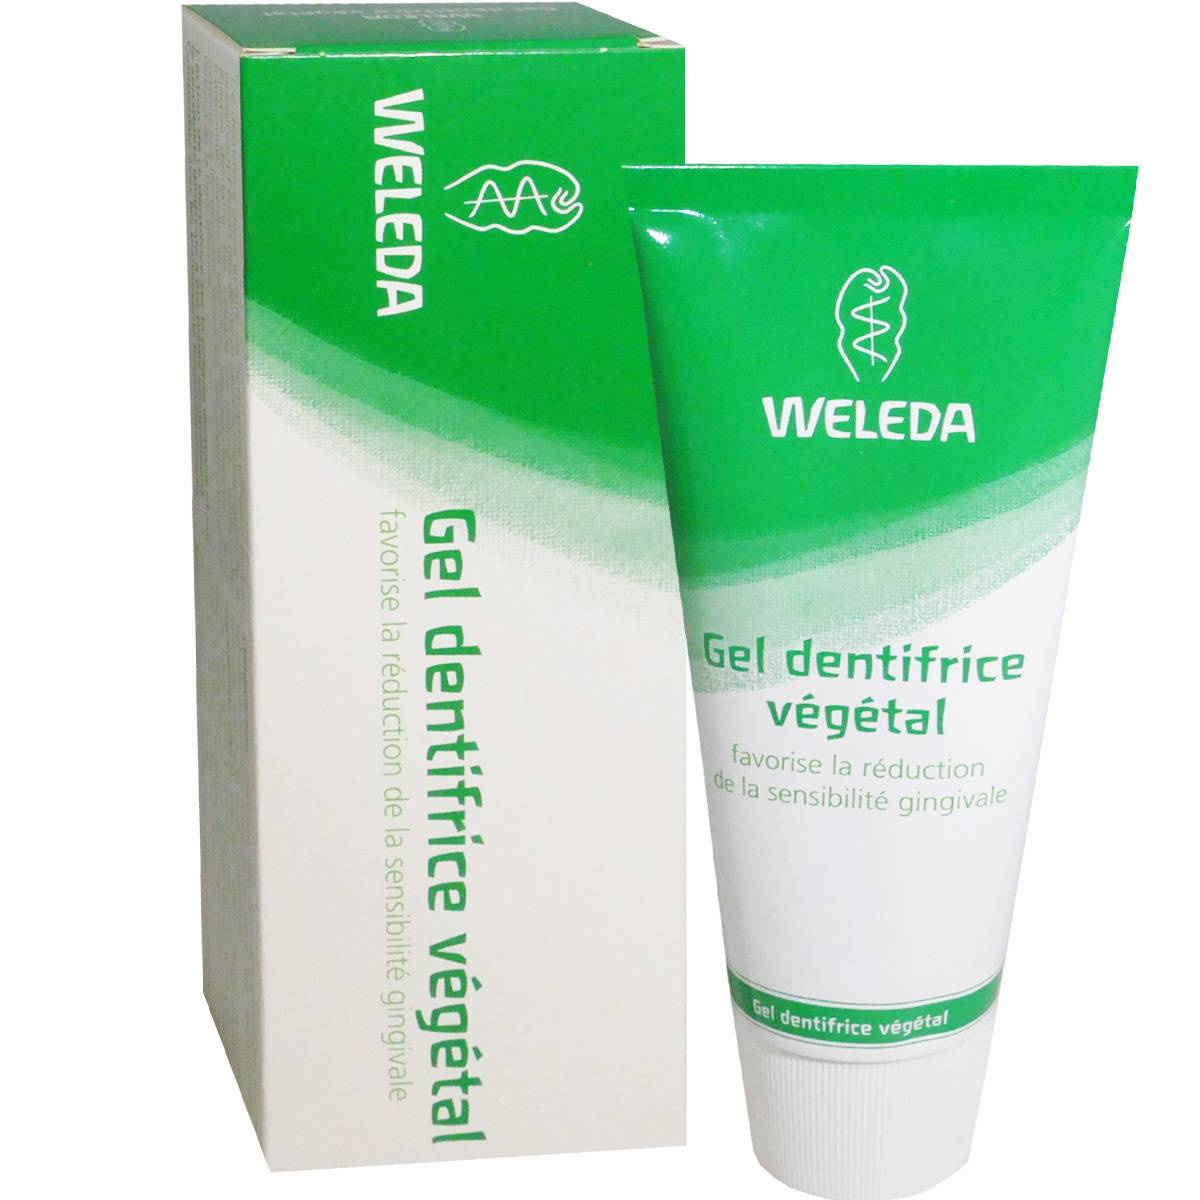 Weleda dentifrice vegetal 75ml